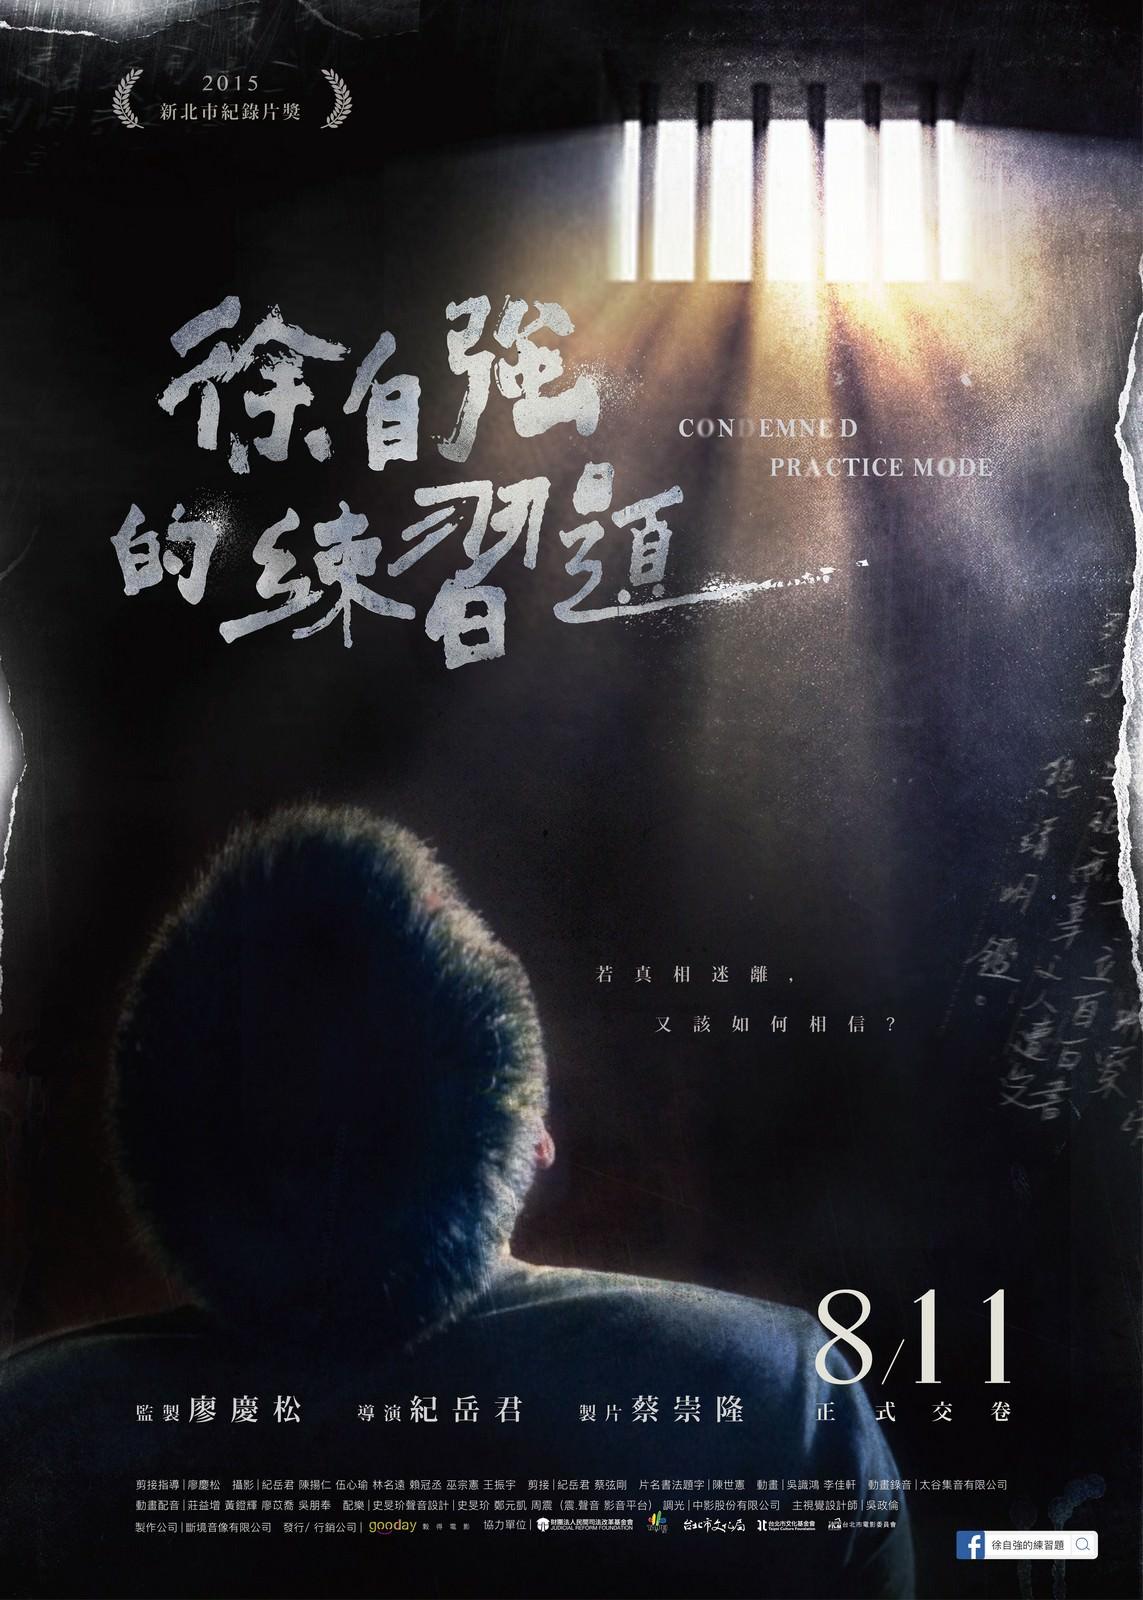 Movie, 徐自強的練習題(台灣, 2017年) / Condemned Practice Mode(英文), 電影海報, 台灣